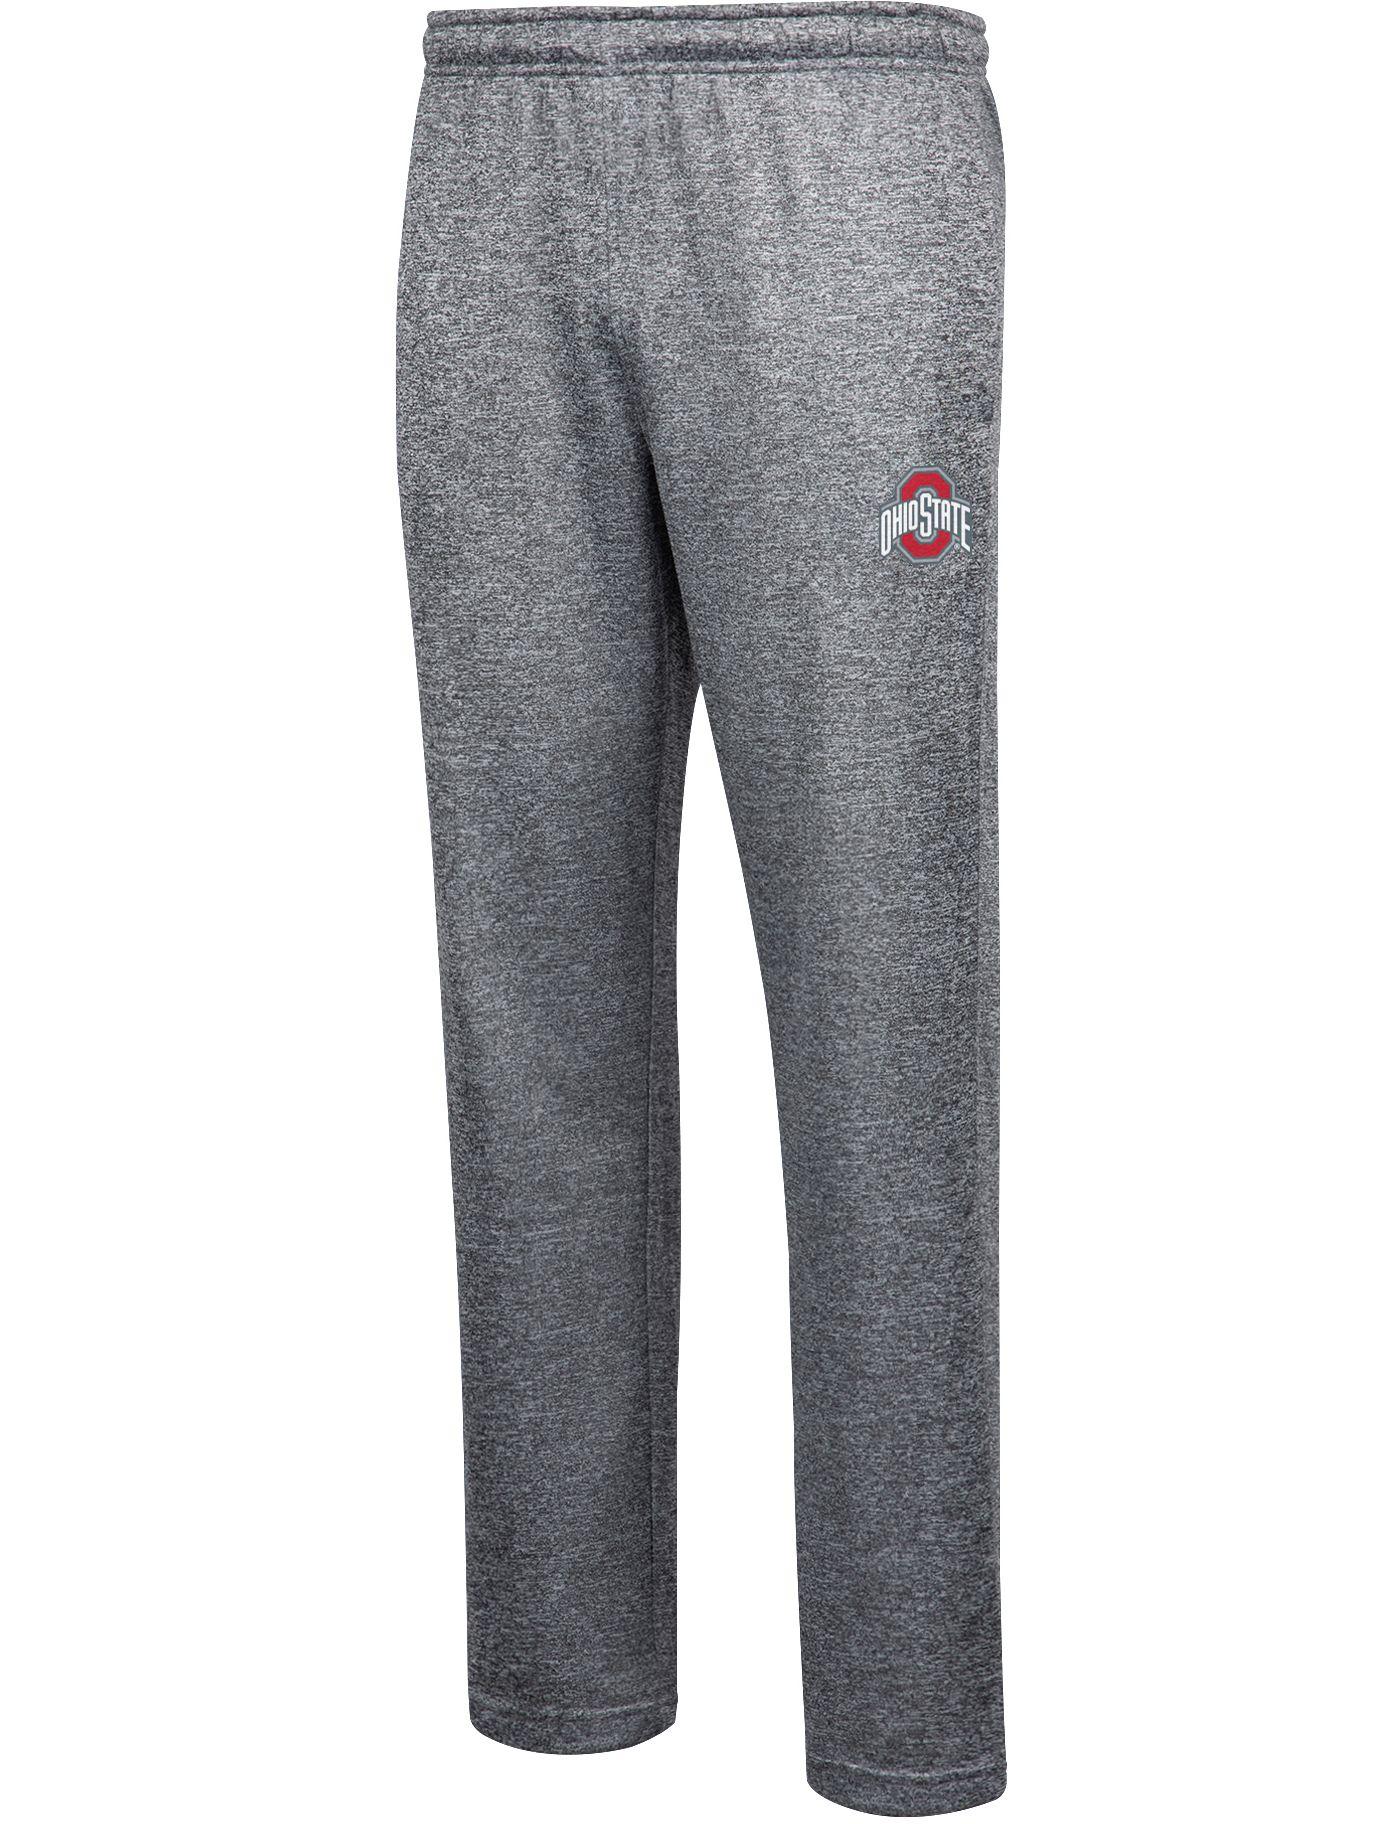 Scarlet & Gray Men's Ohio State Buckeyes Gray Match-Up Pants